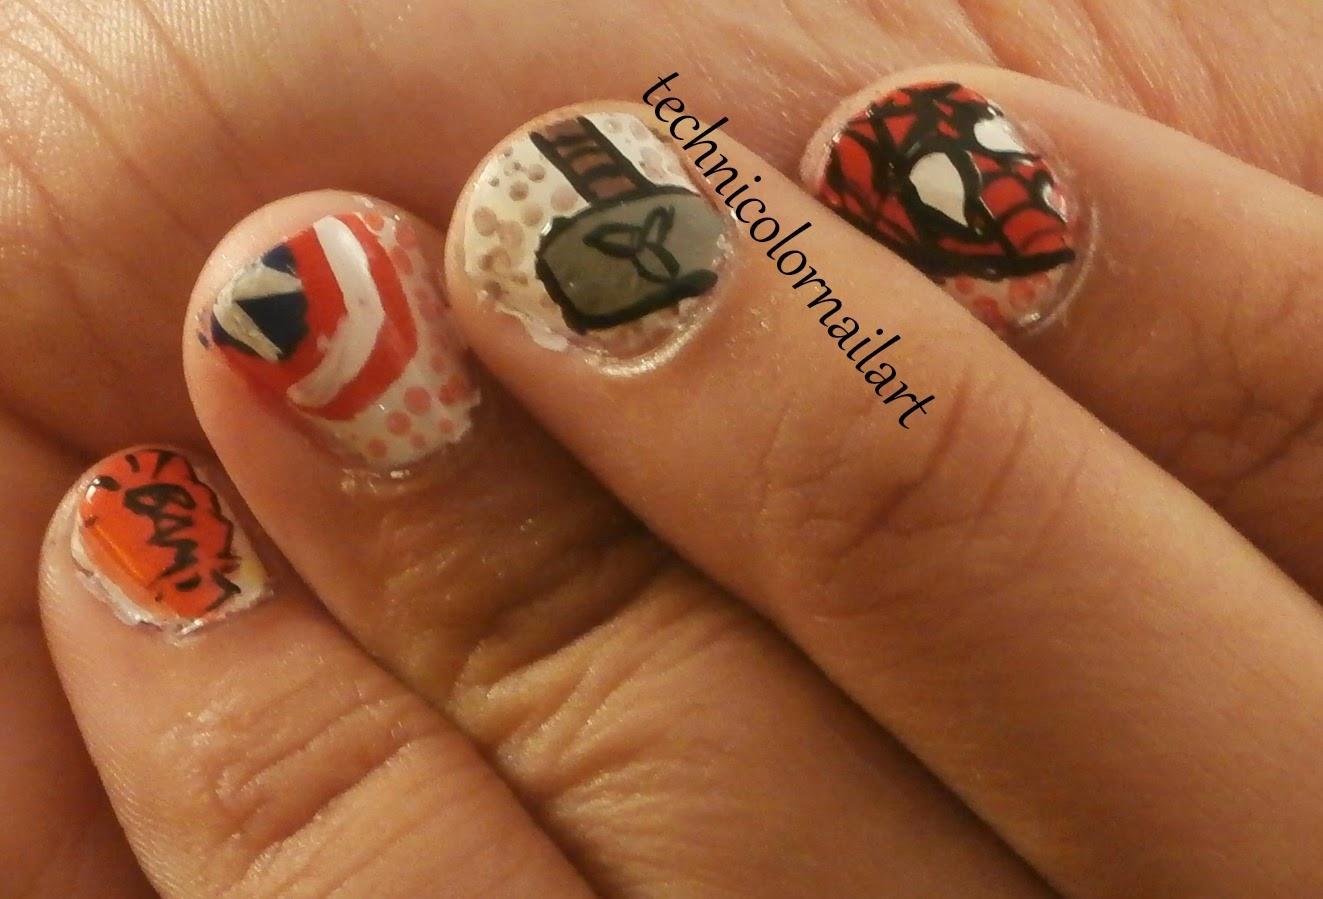 Technicolor Nail Art: FingerFood Theme Buffet: Marvel Comic Nails!